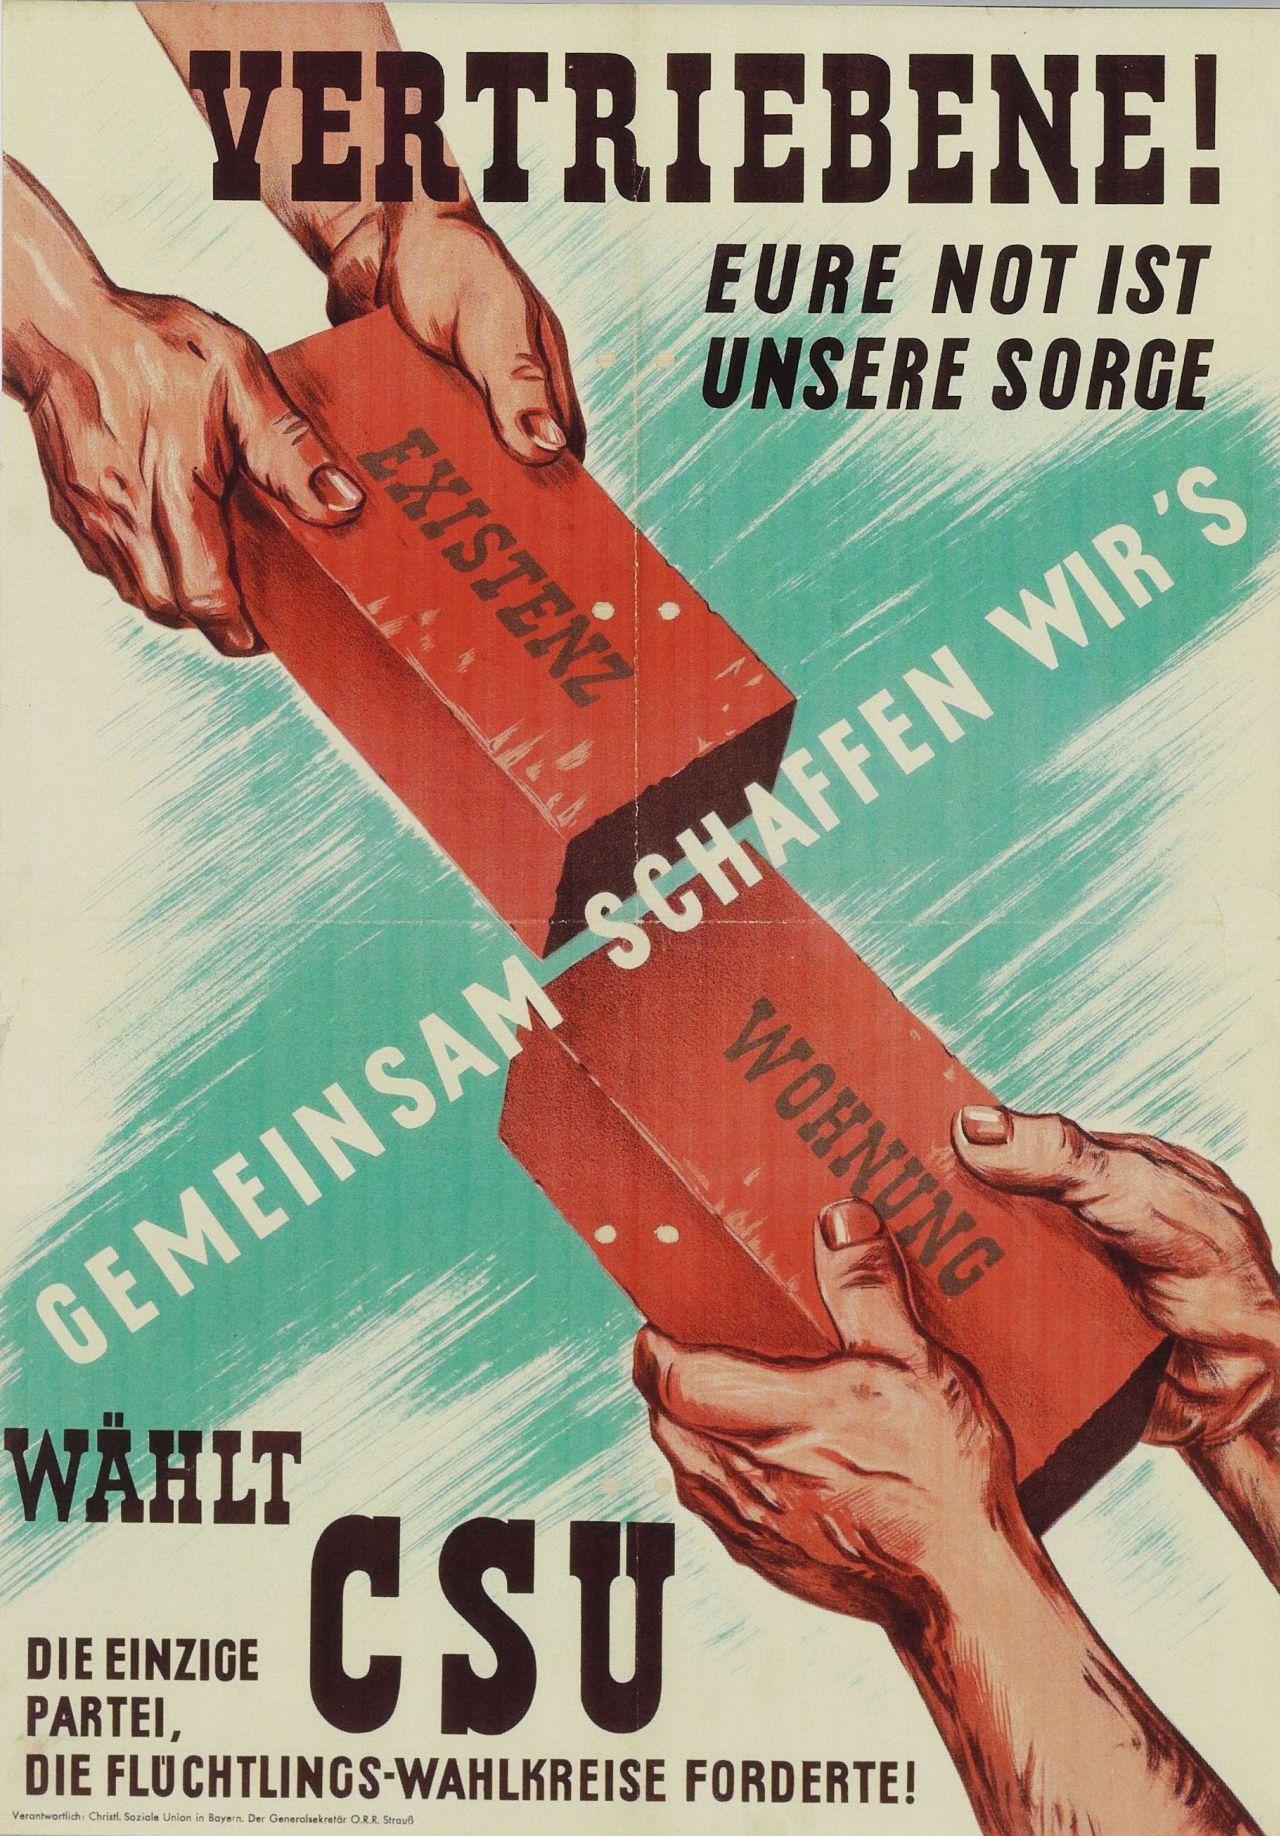 https://www.hdg.de/lemo/img_hd/bestand/objekte/nachkriegsjahre/wahlplakat-csu-vertriebene_plakat_LEMO-8-035.jpg